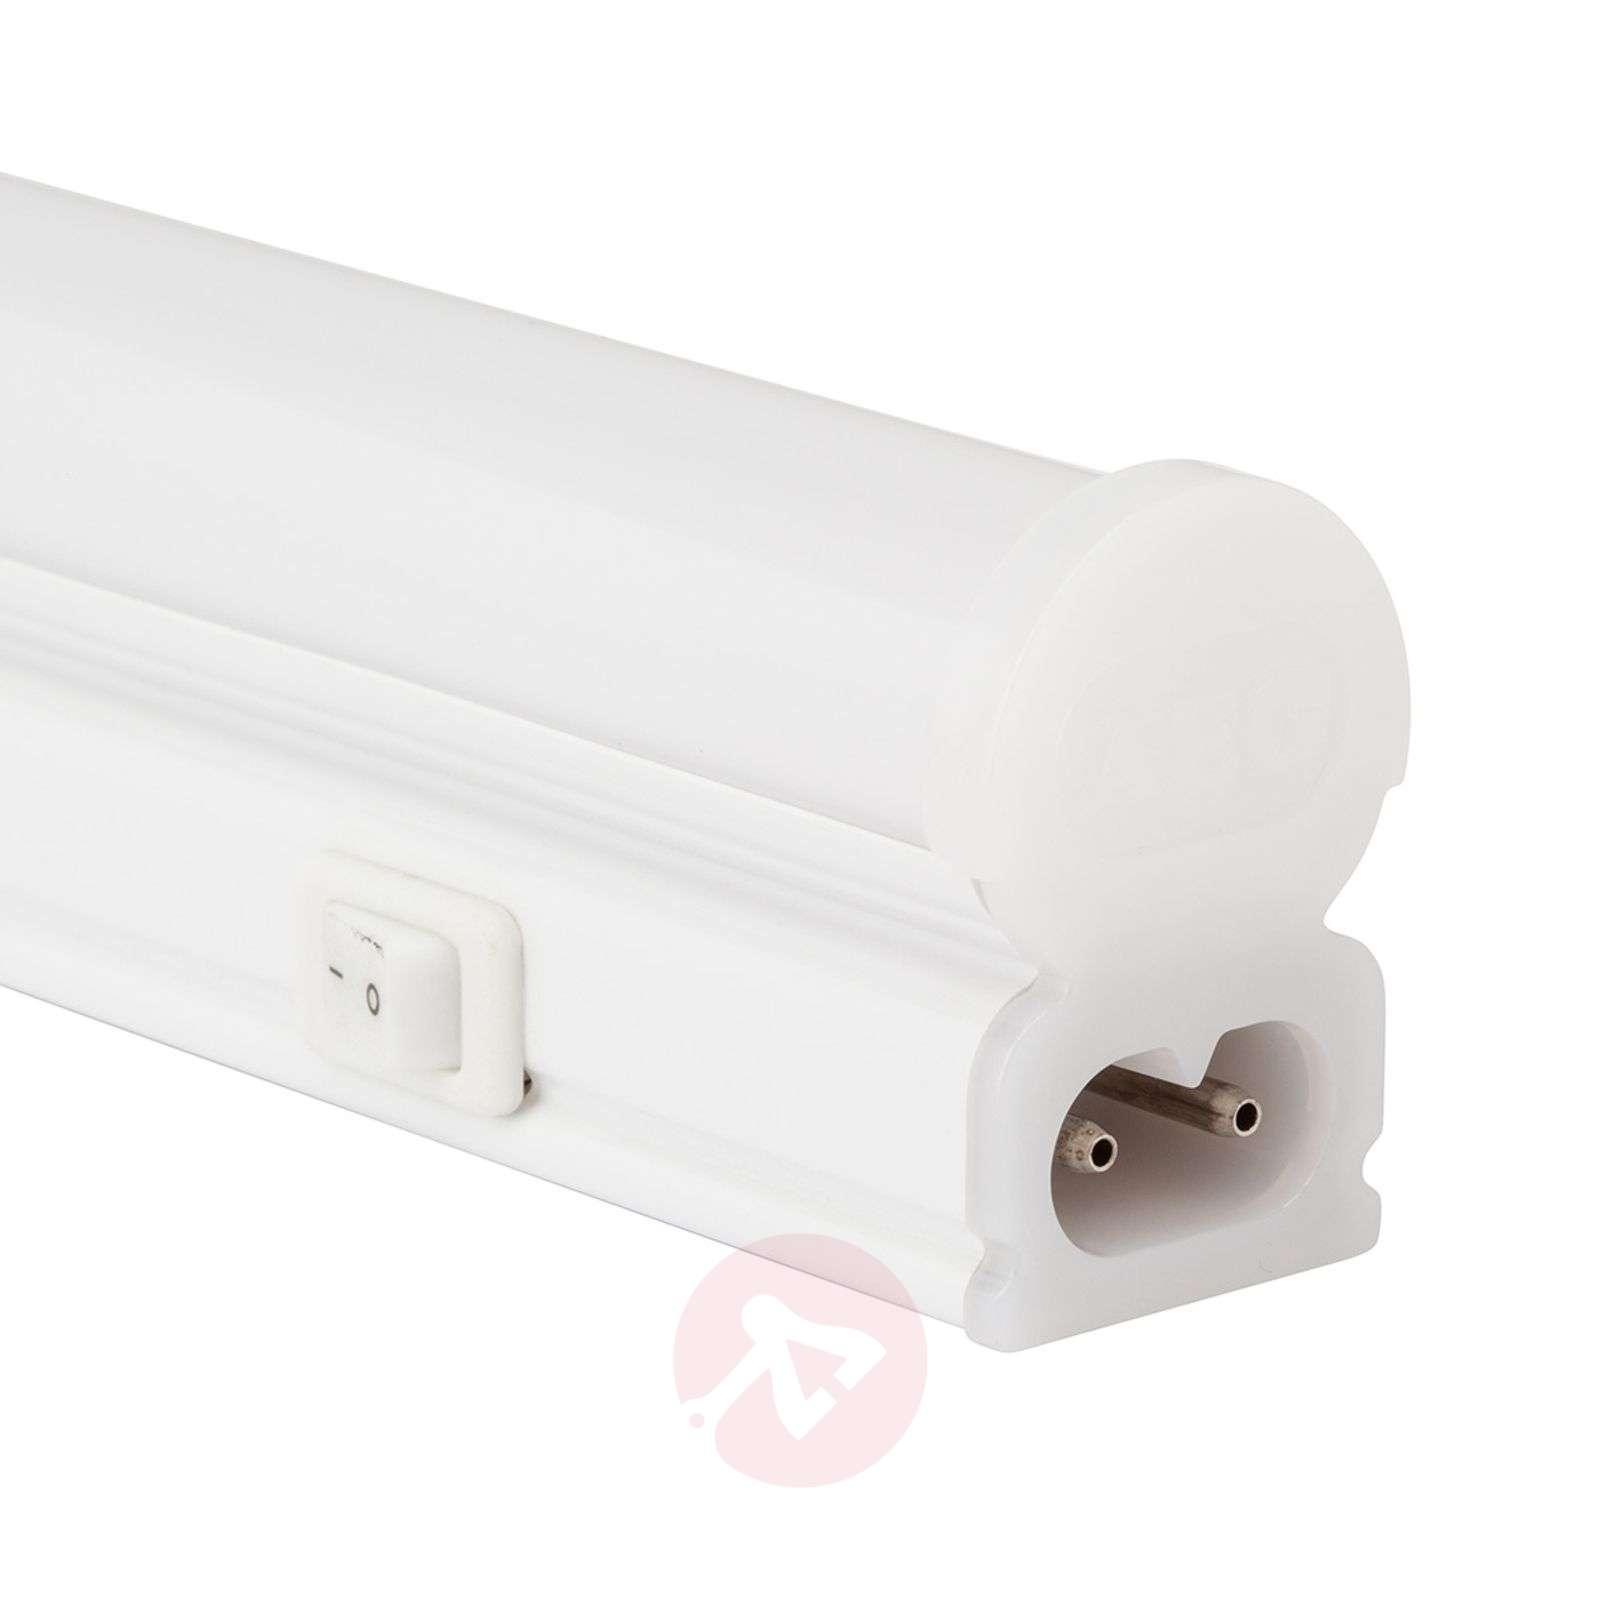 AEG LED Cove Light under-cabinet light 4W, cw-3057015-01